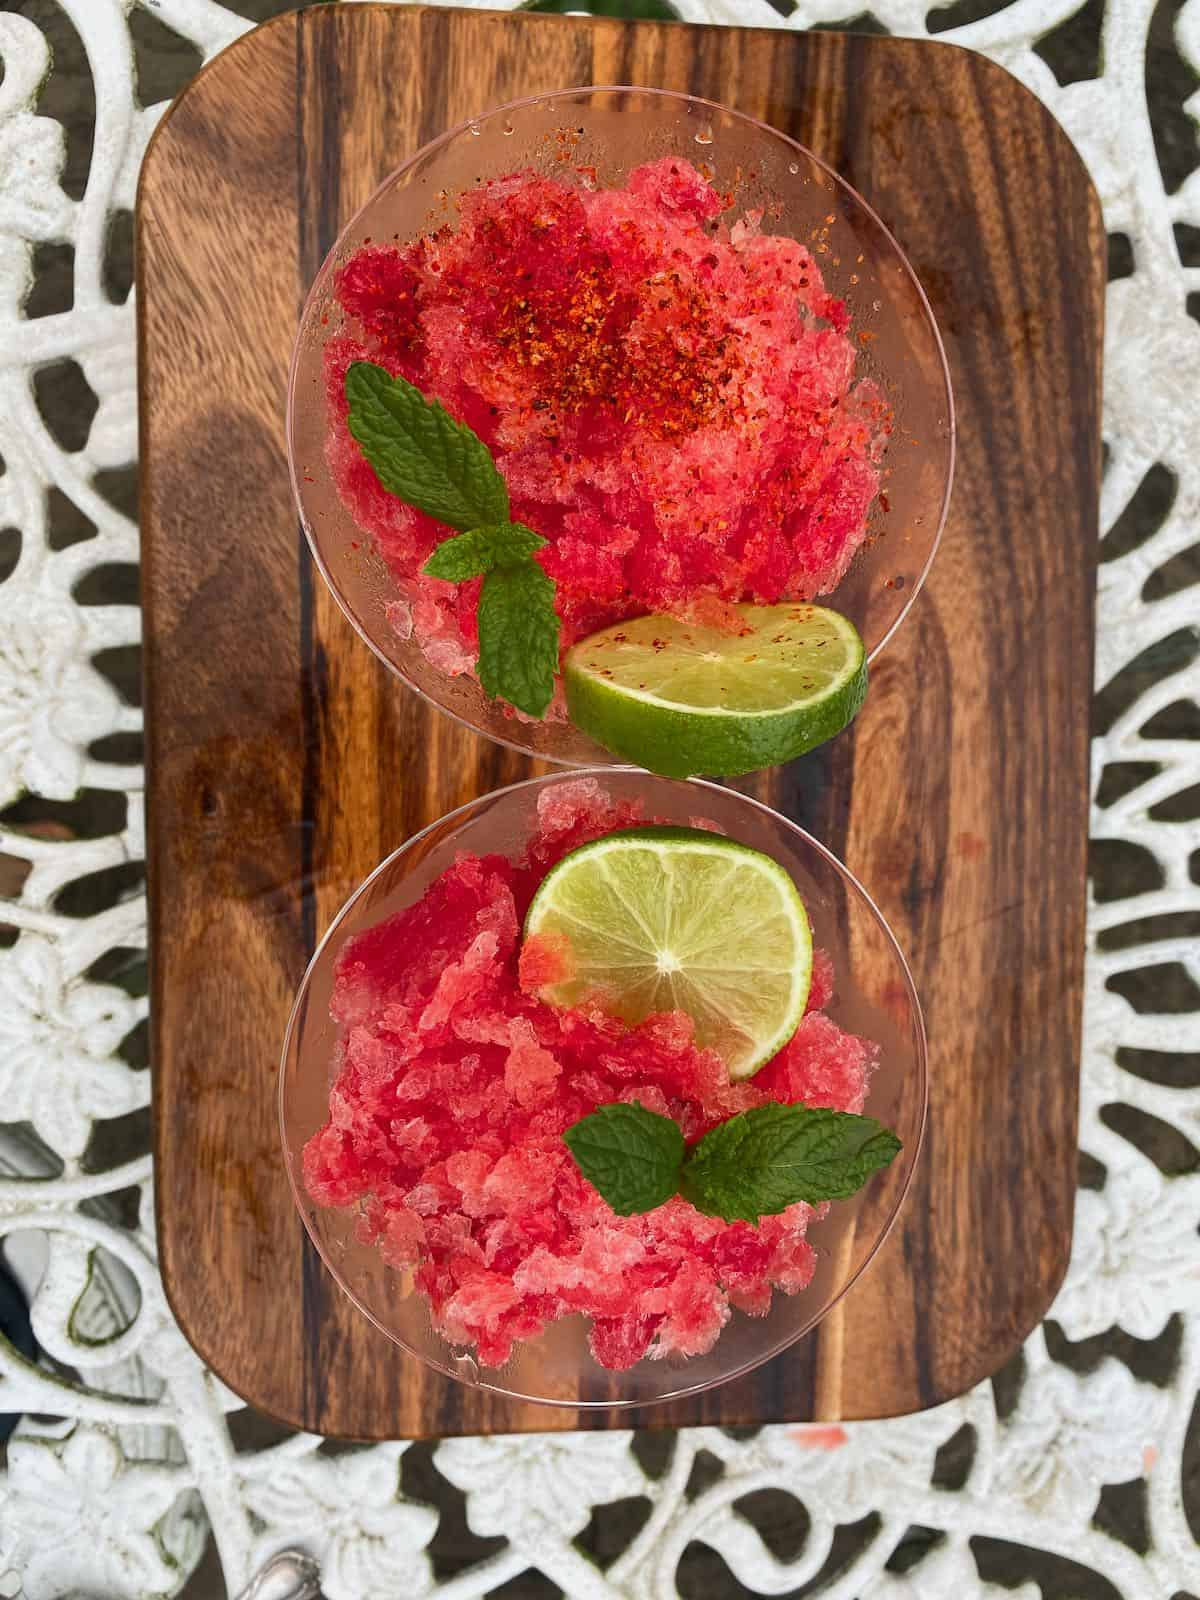 Two servings of watermelon slush